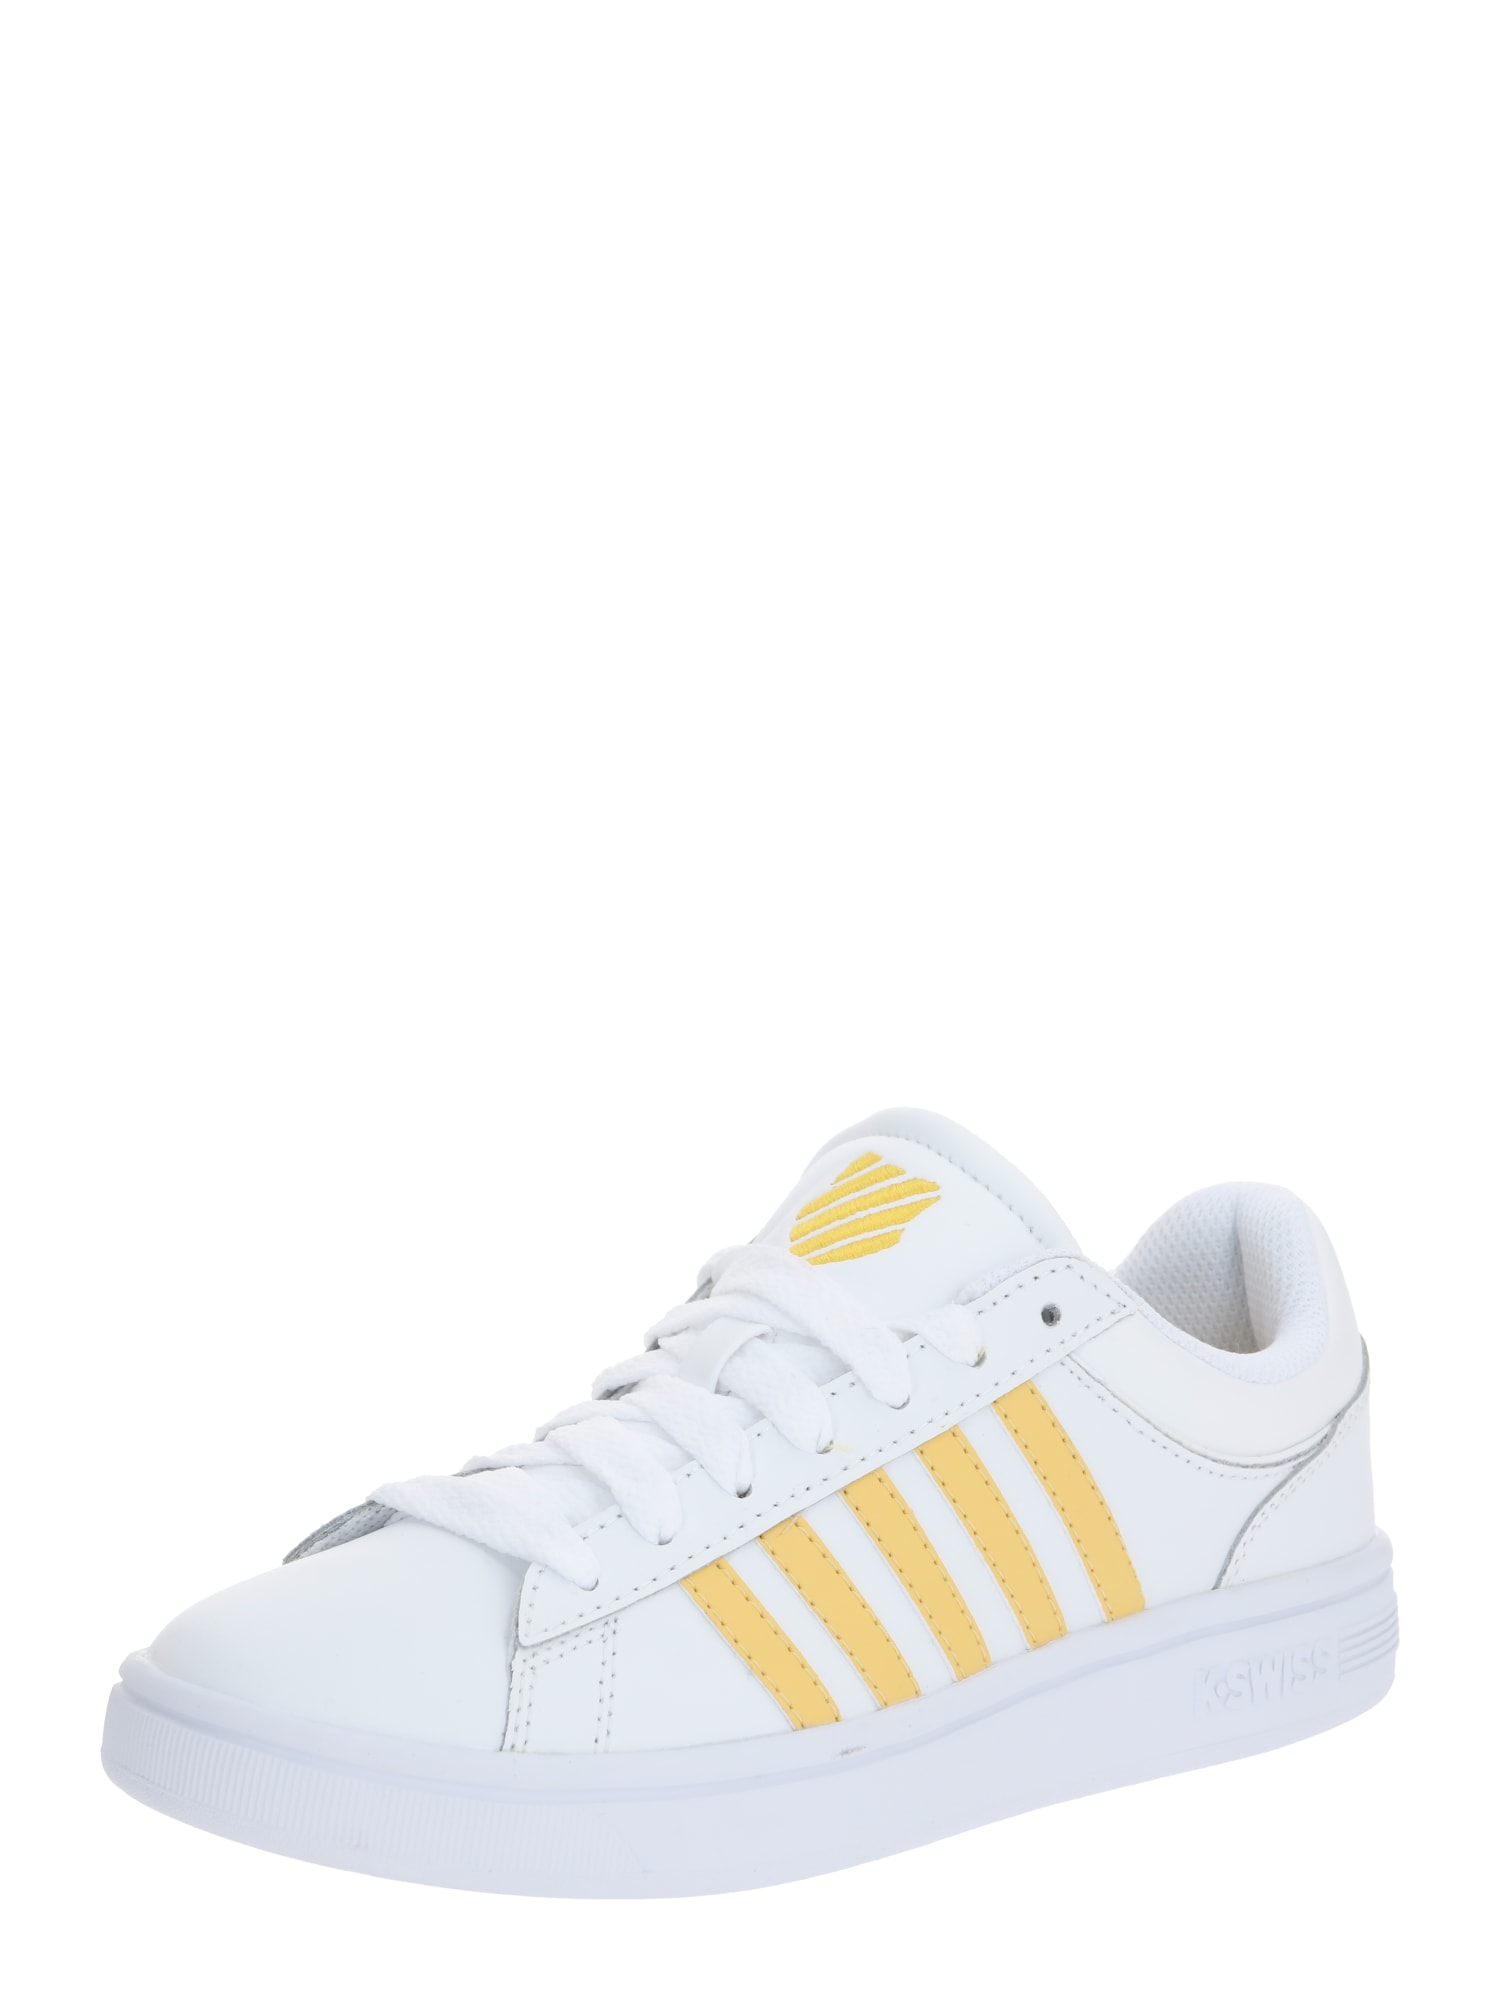 K-SWISS Tenisky 'Court Winston'  žlutá / bílá